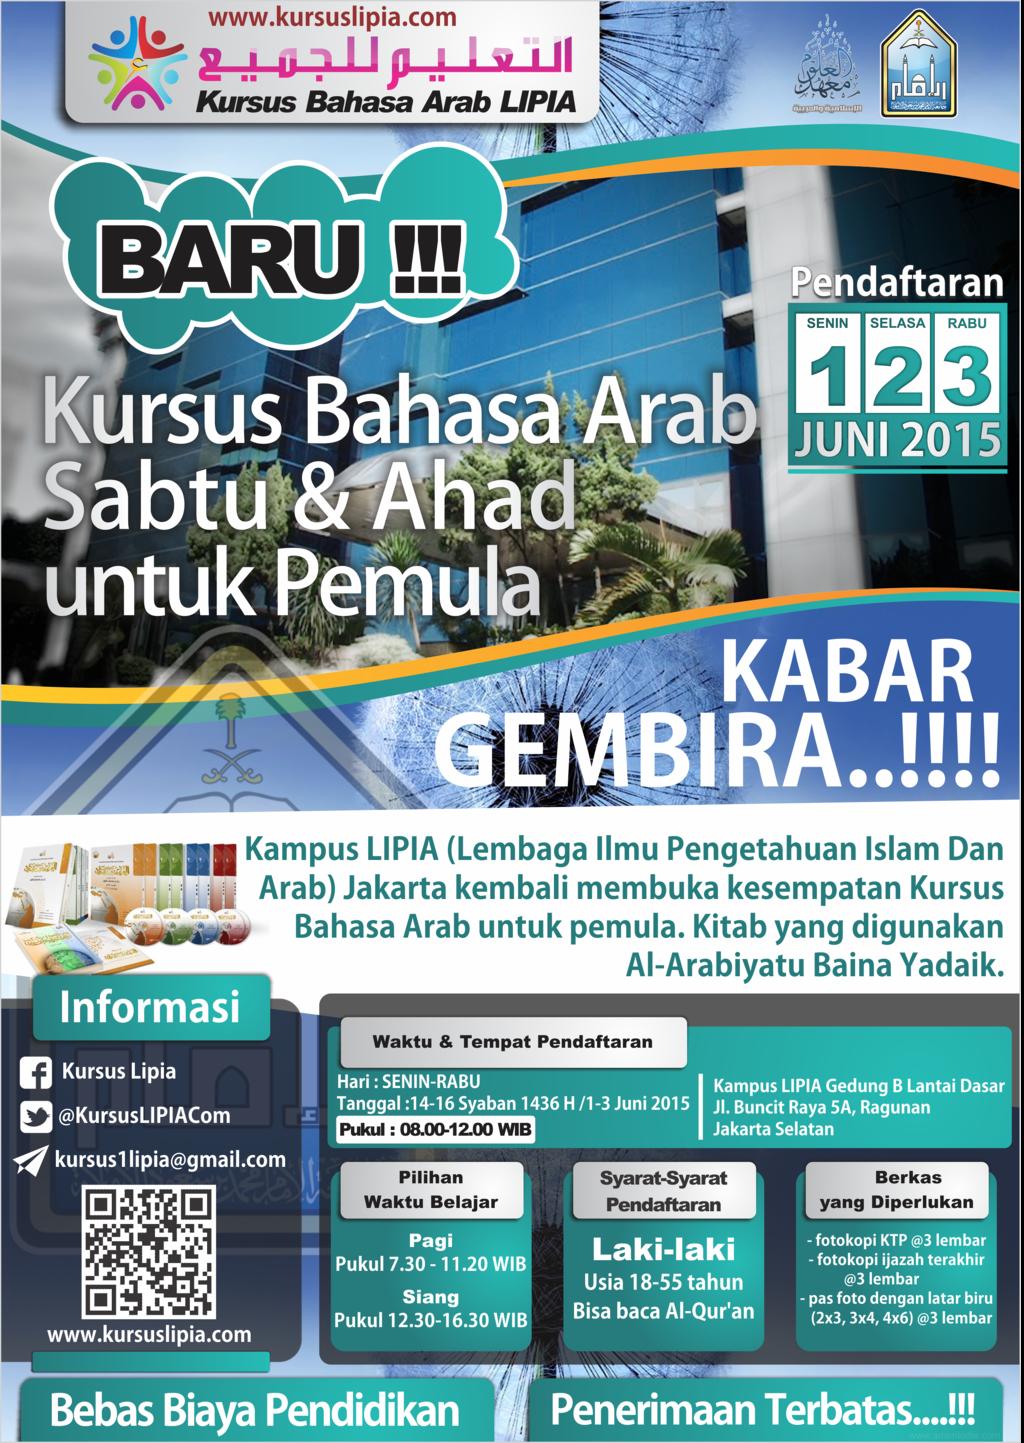 Desain Brosur Kursus Bahasa Arab Sabtu Ahad Lipia Jakarta Desain Brosur Bahasa Brosur